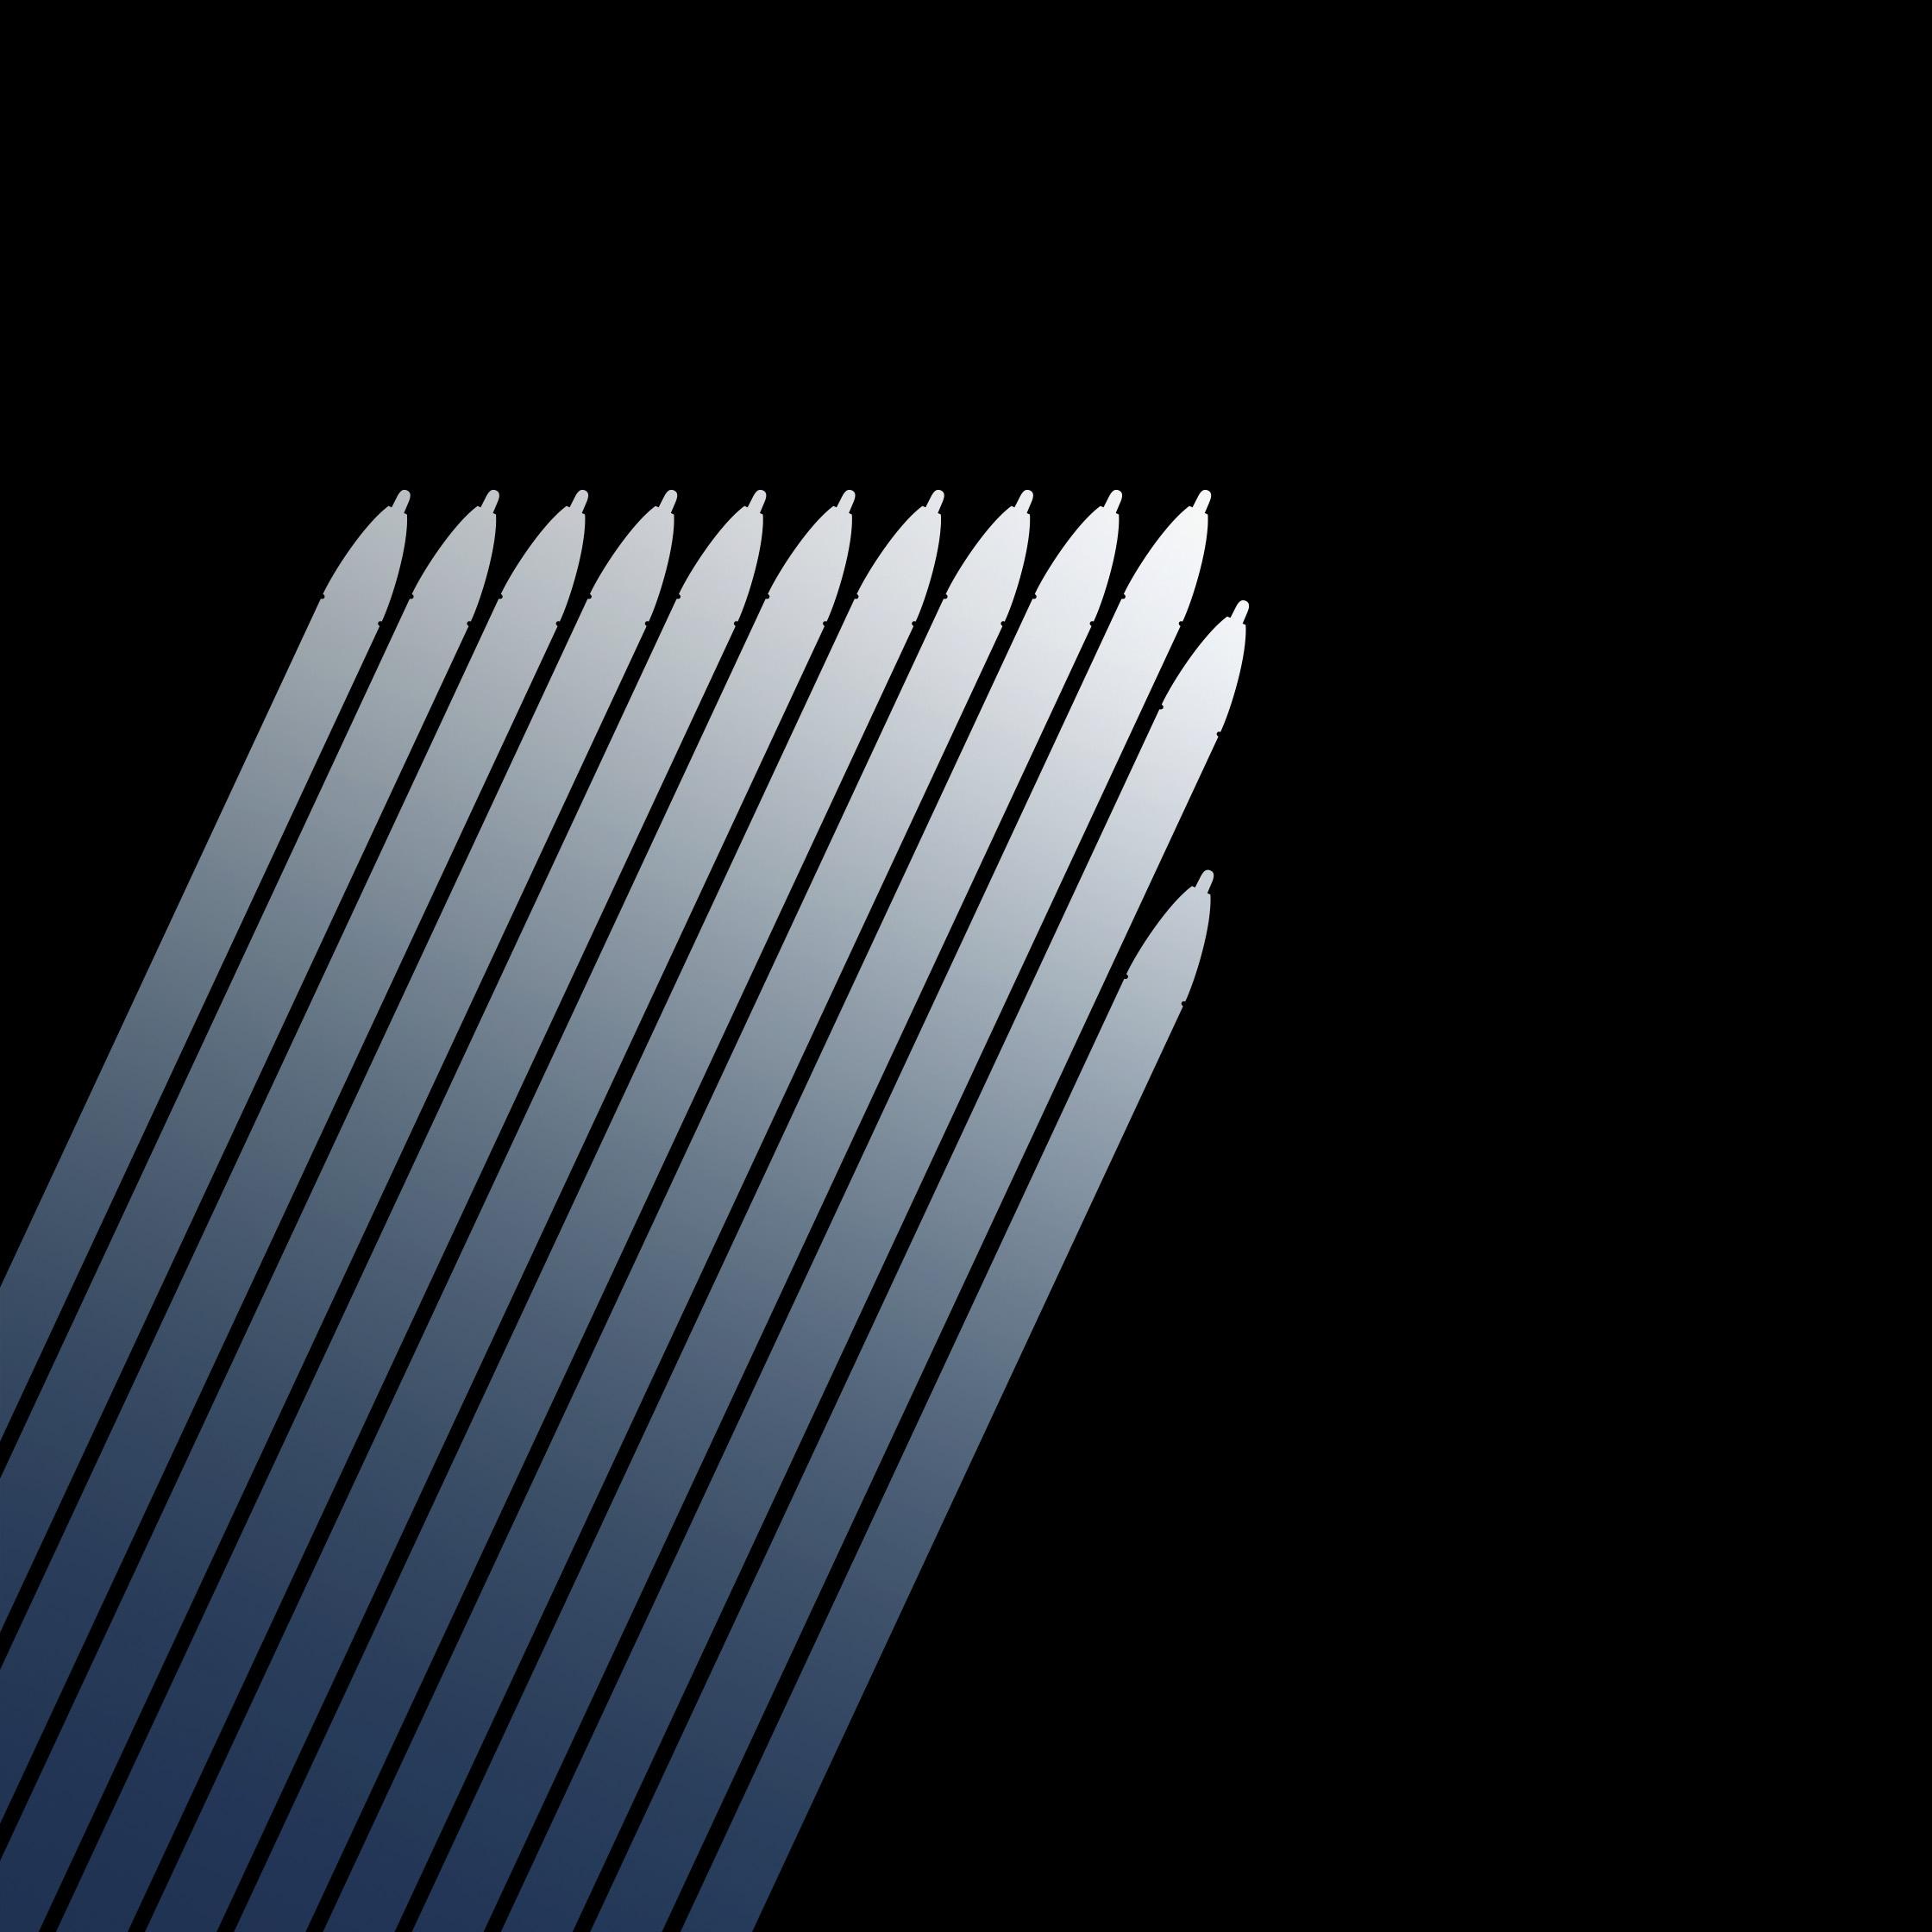 Samsung J Series Wallpaper Hd 1080p